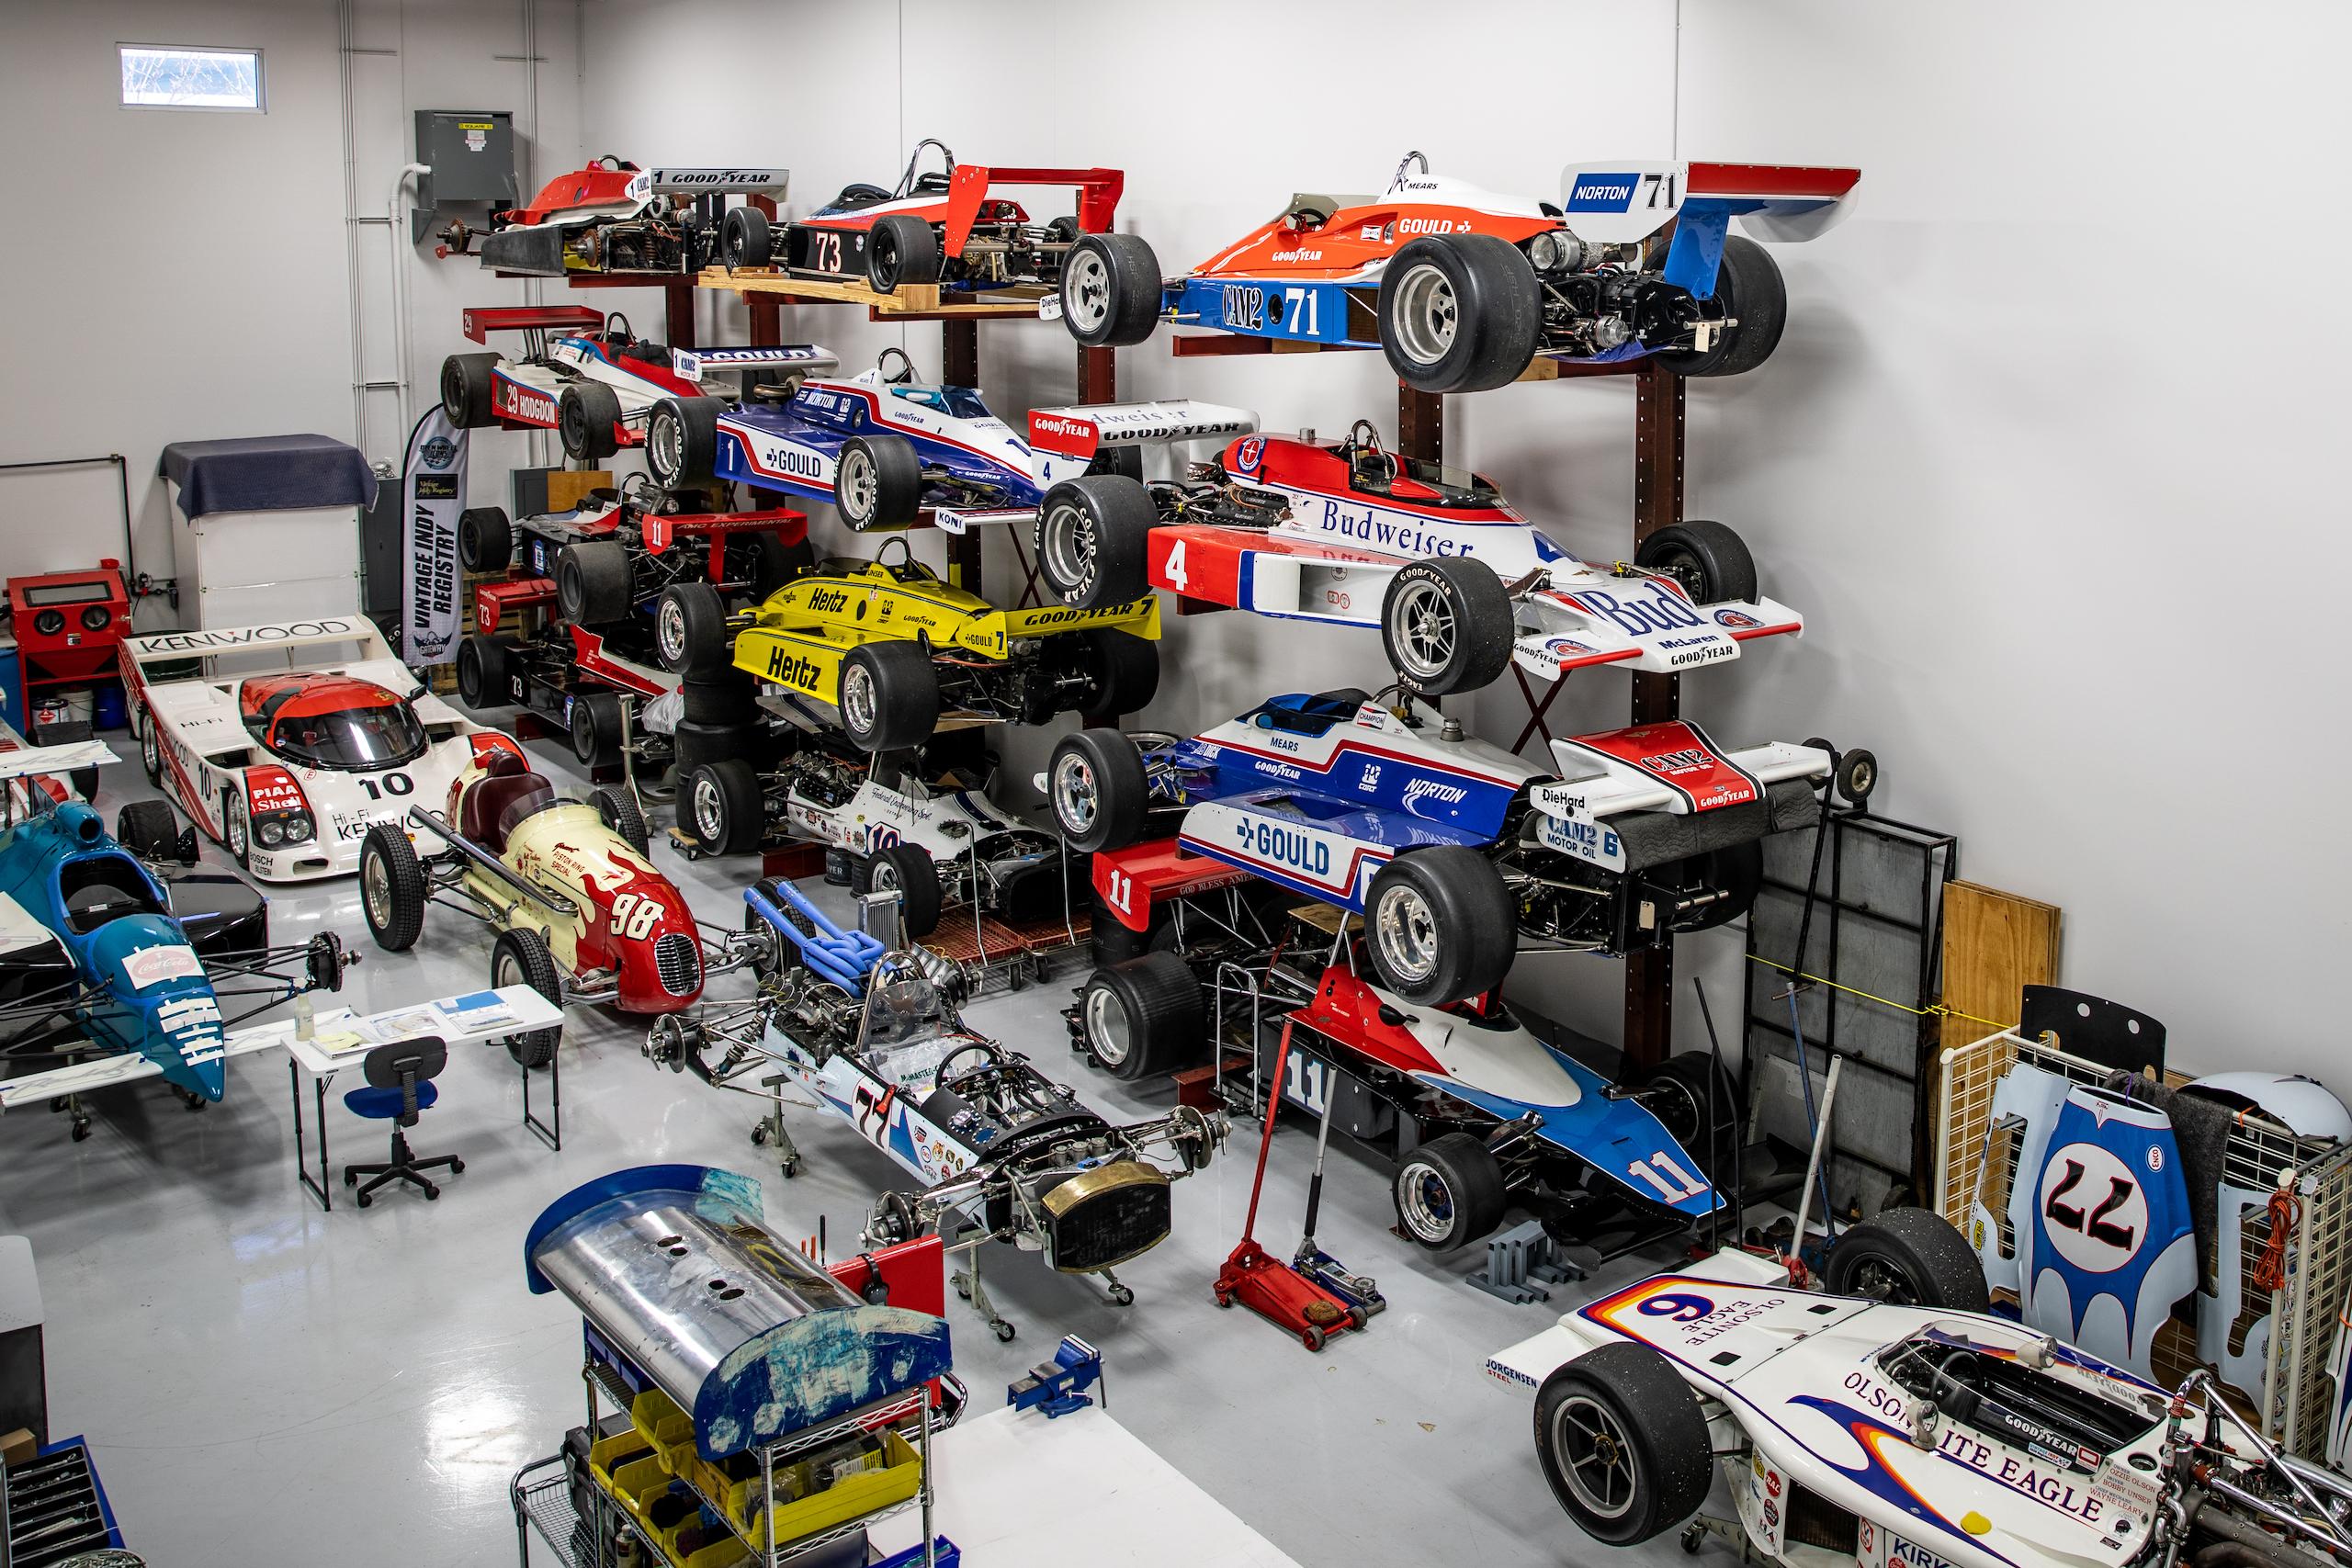 Turn 4 Restorations cars